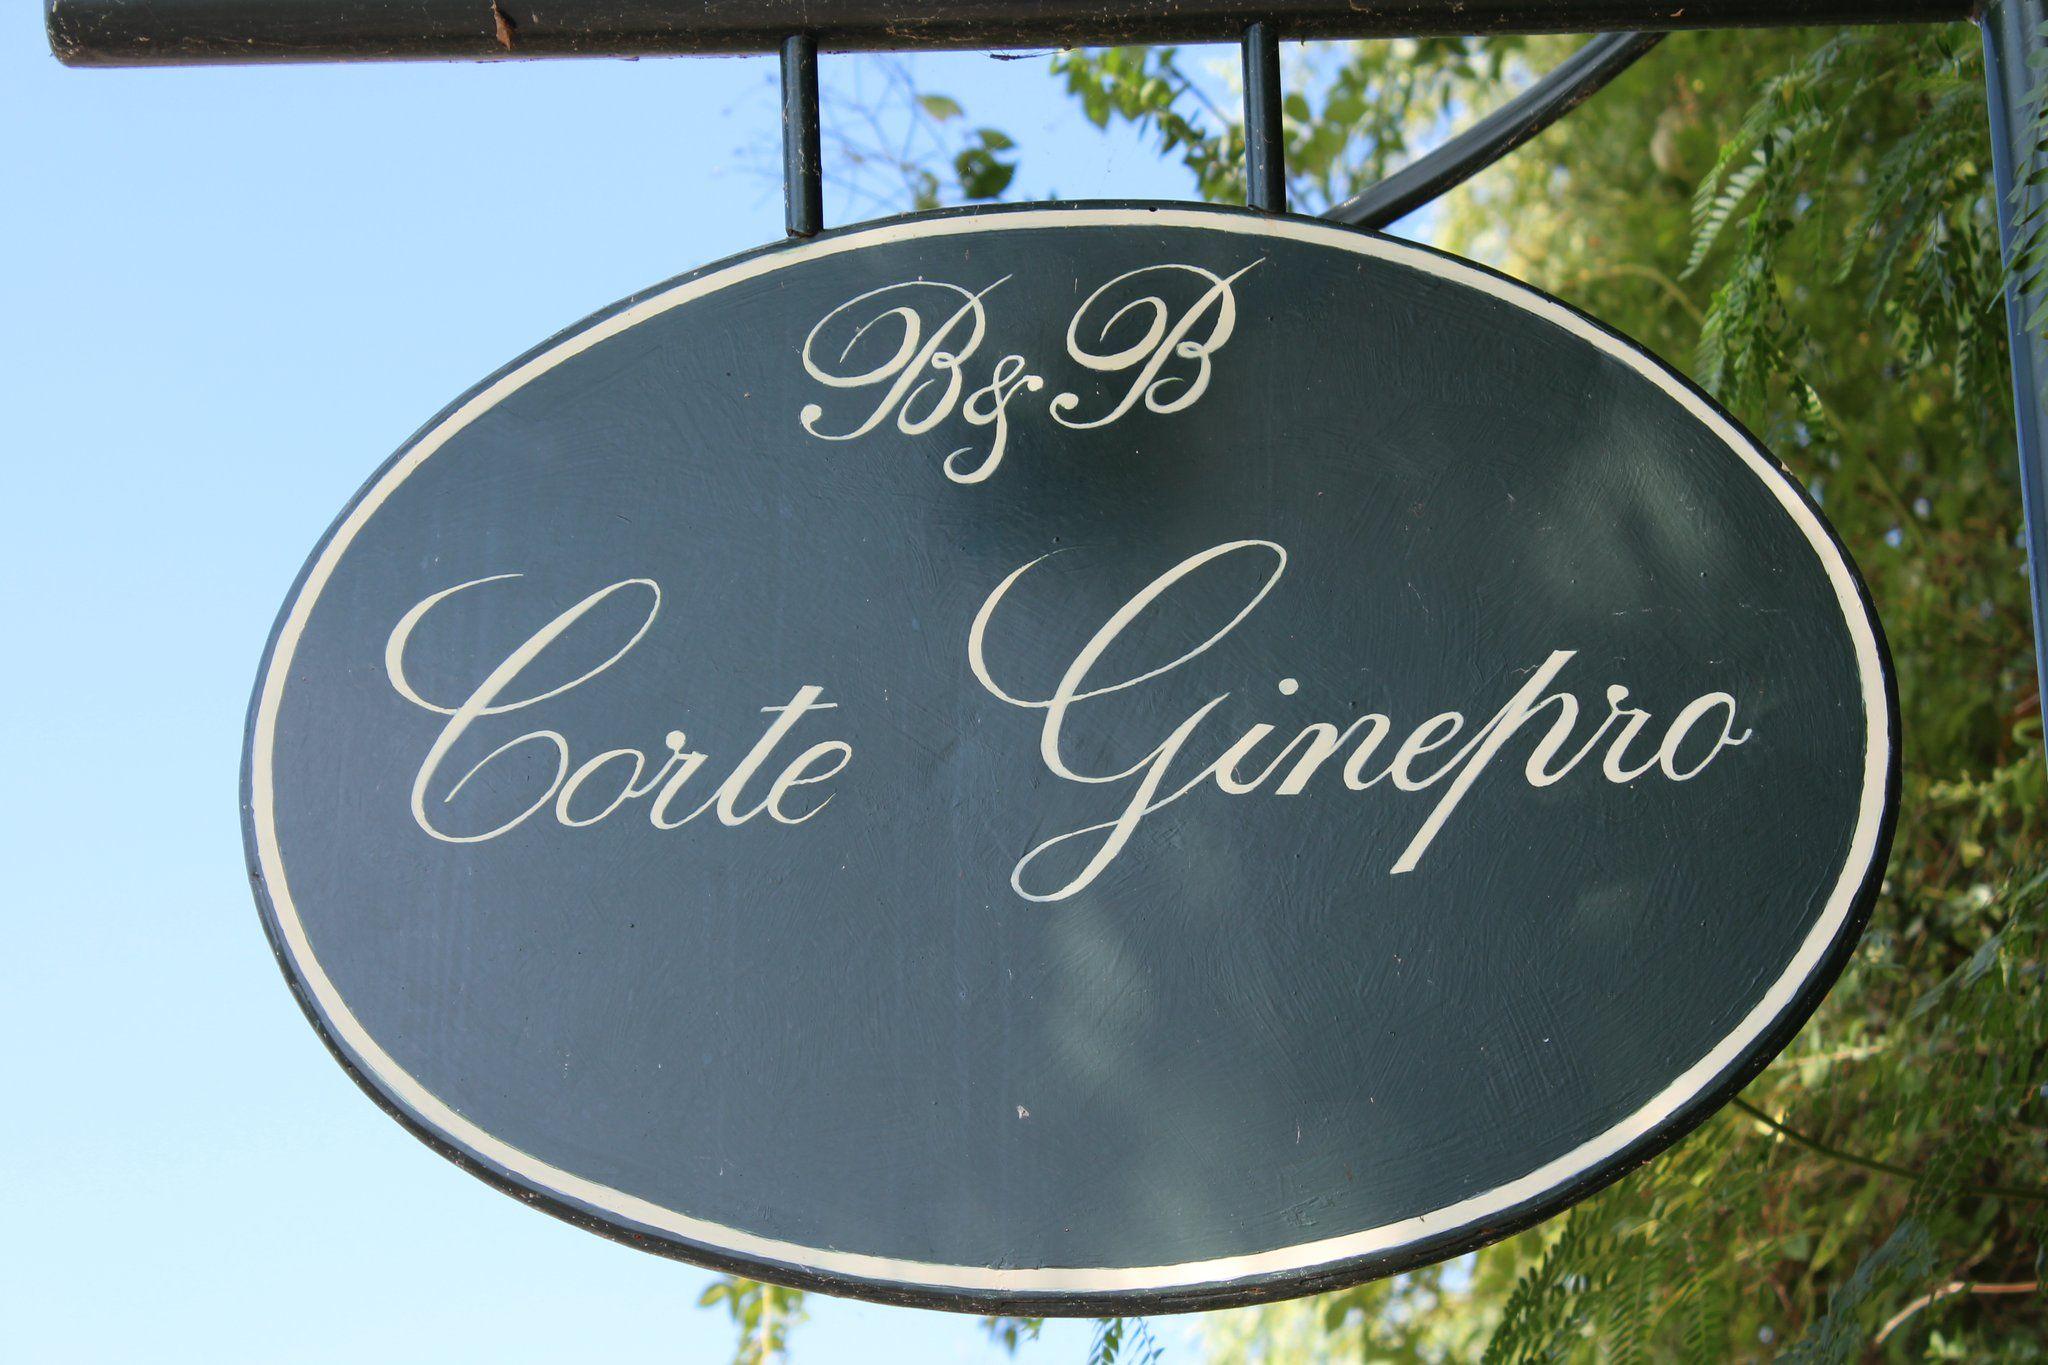 Corte Ginepro